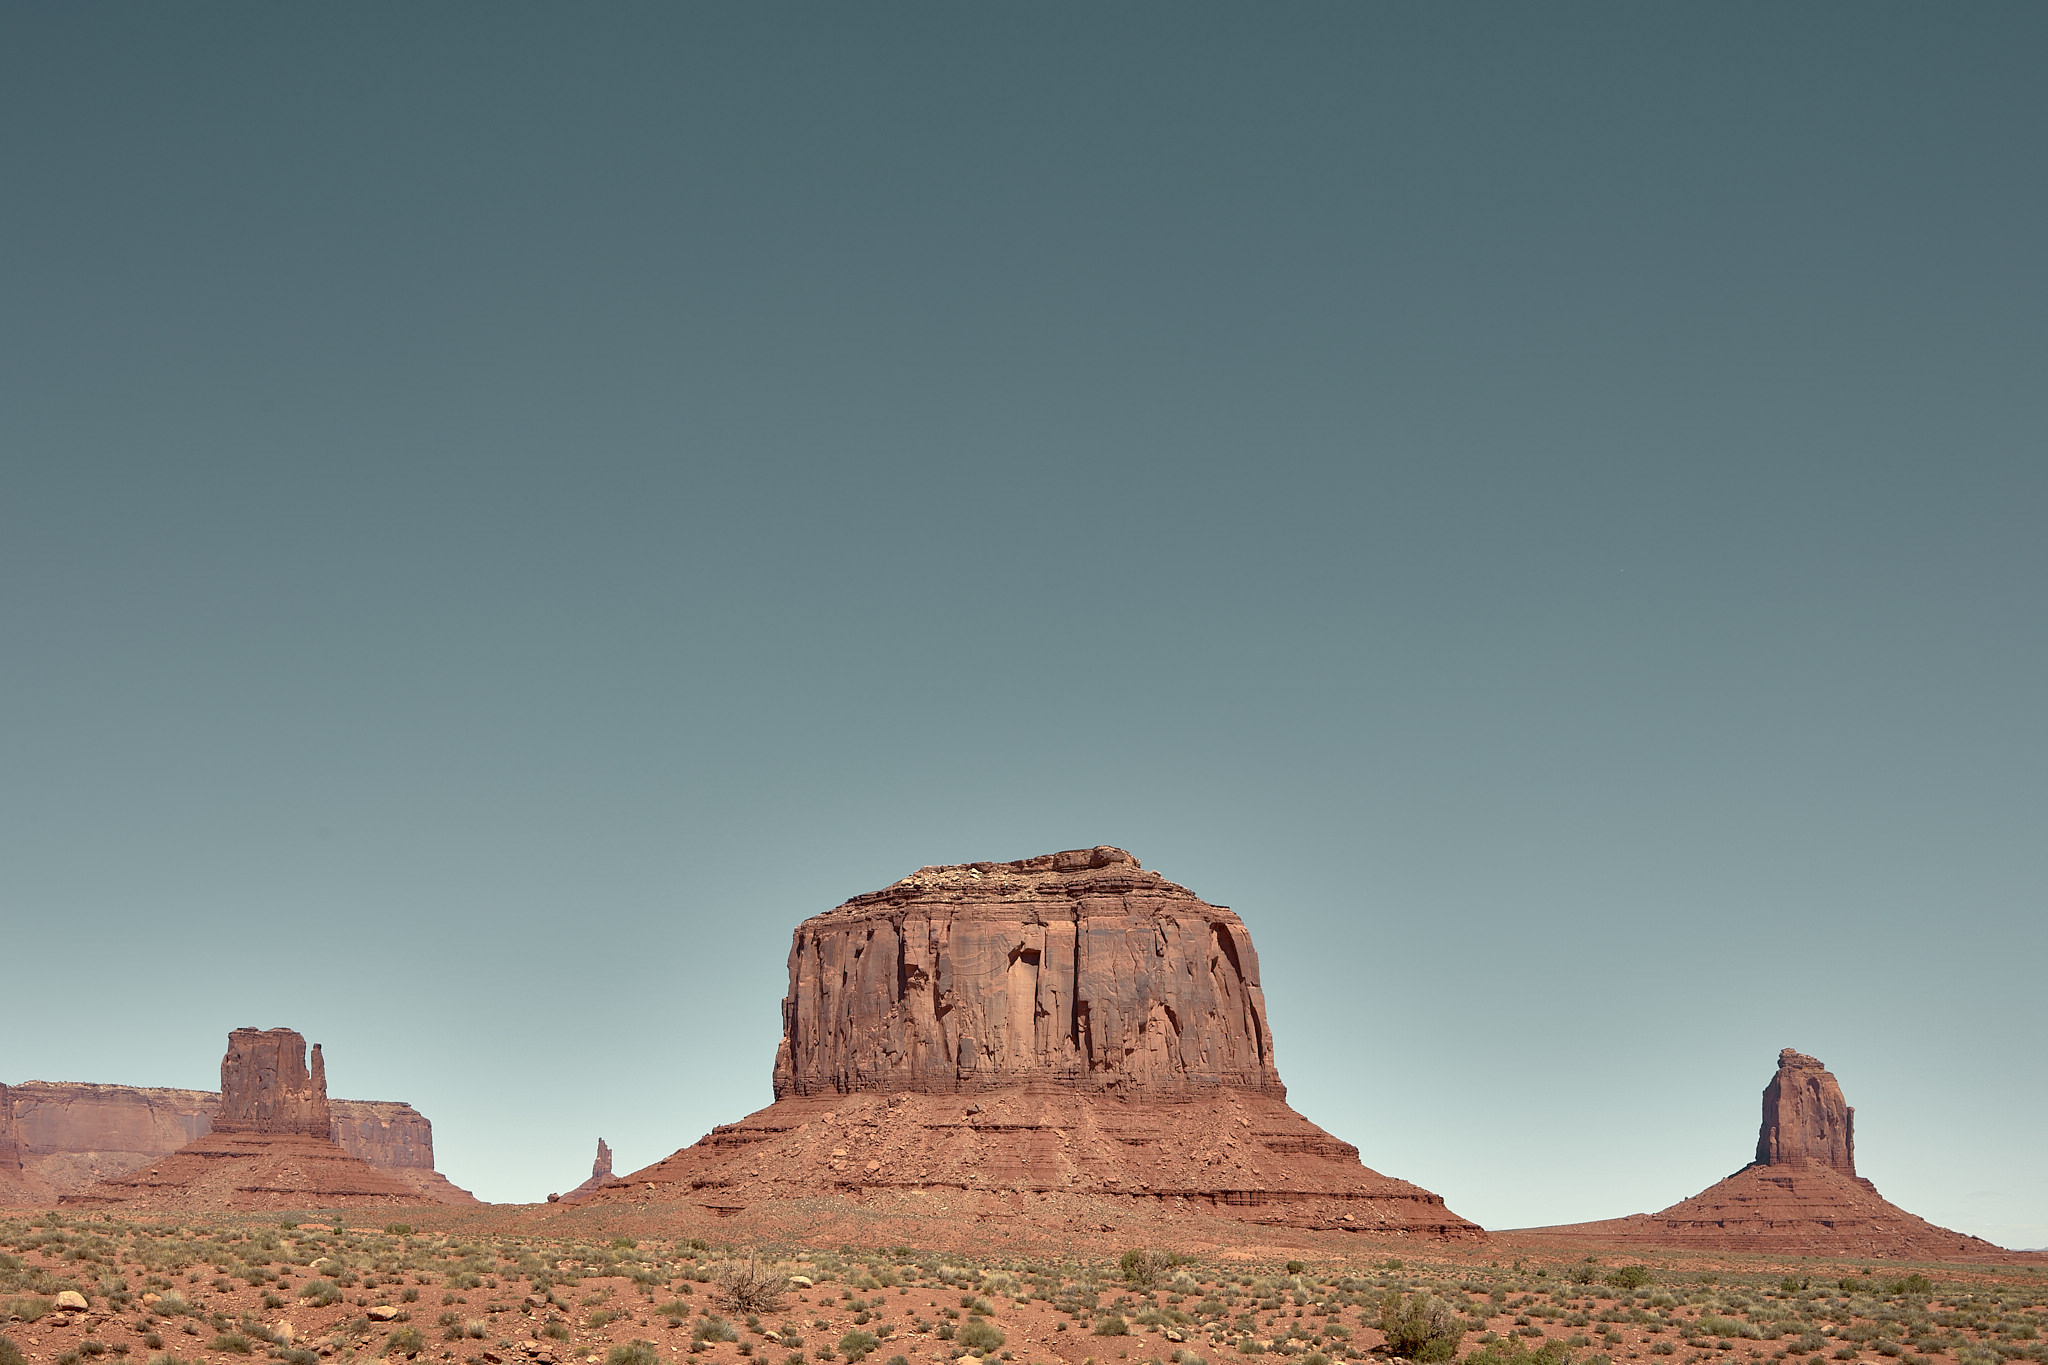 Digital Photography: Exploring Monument Valley, Arizona